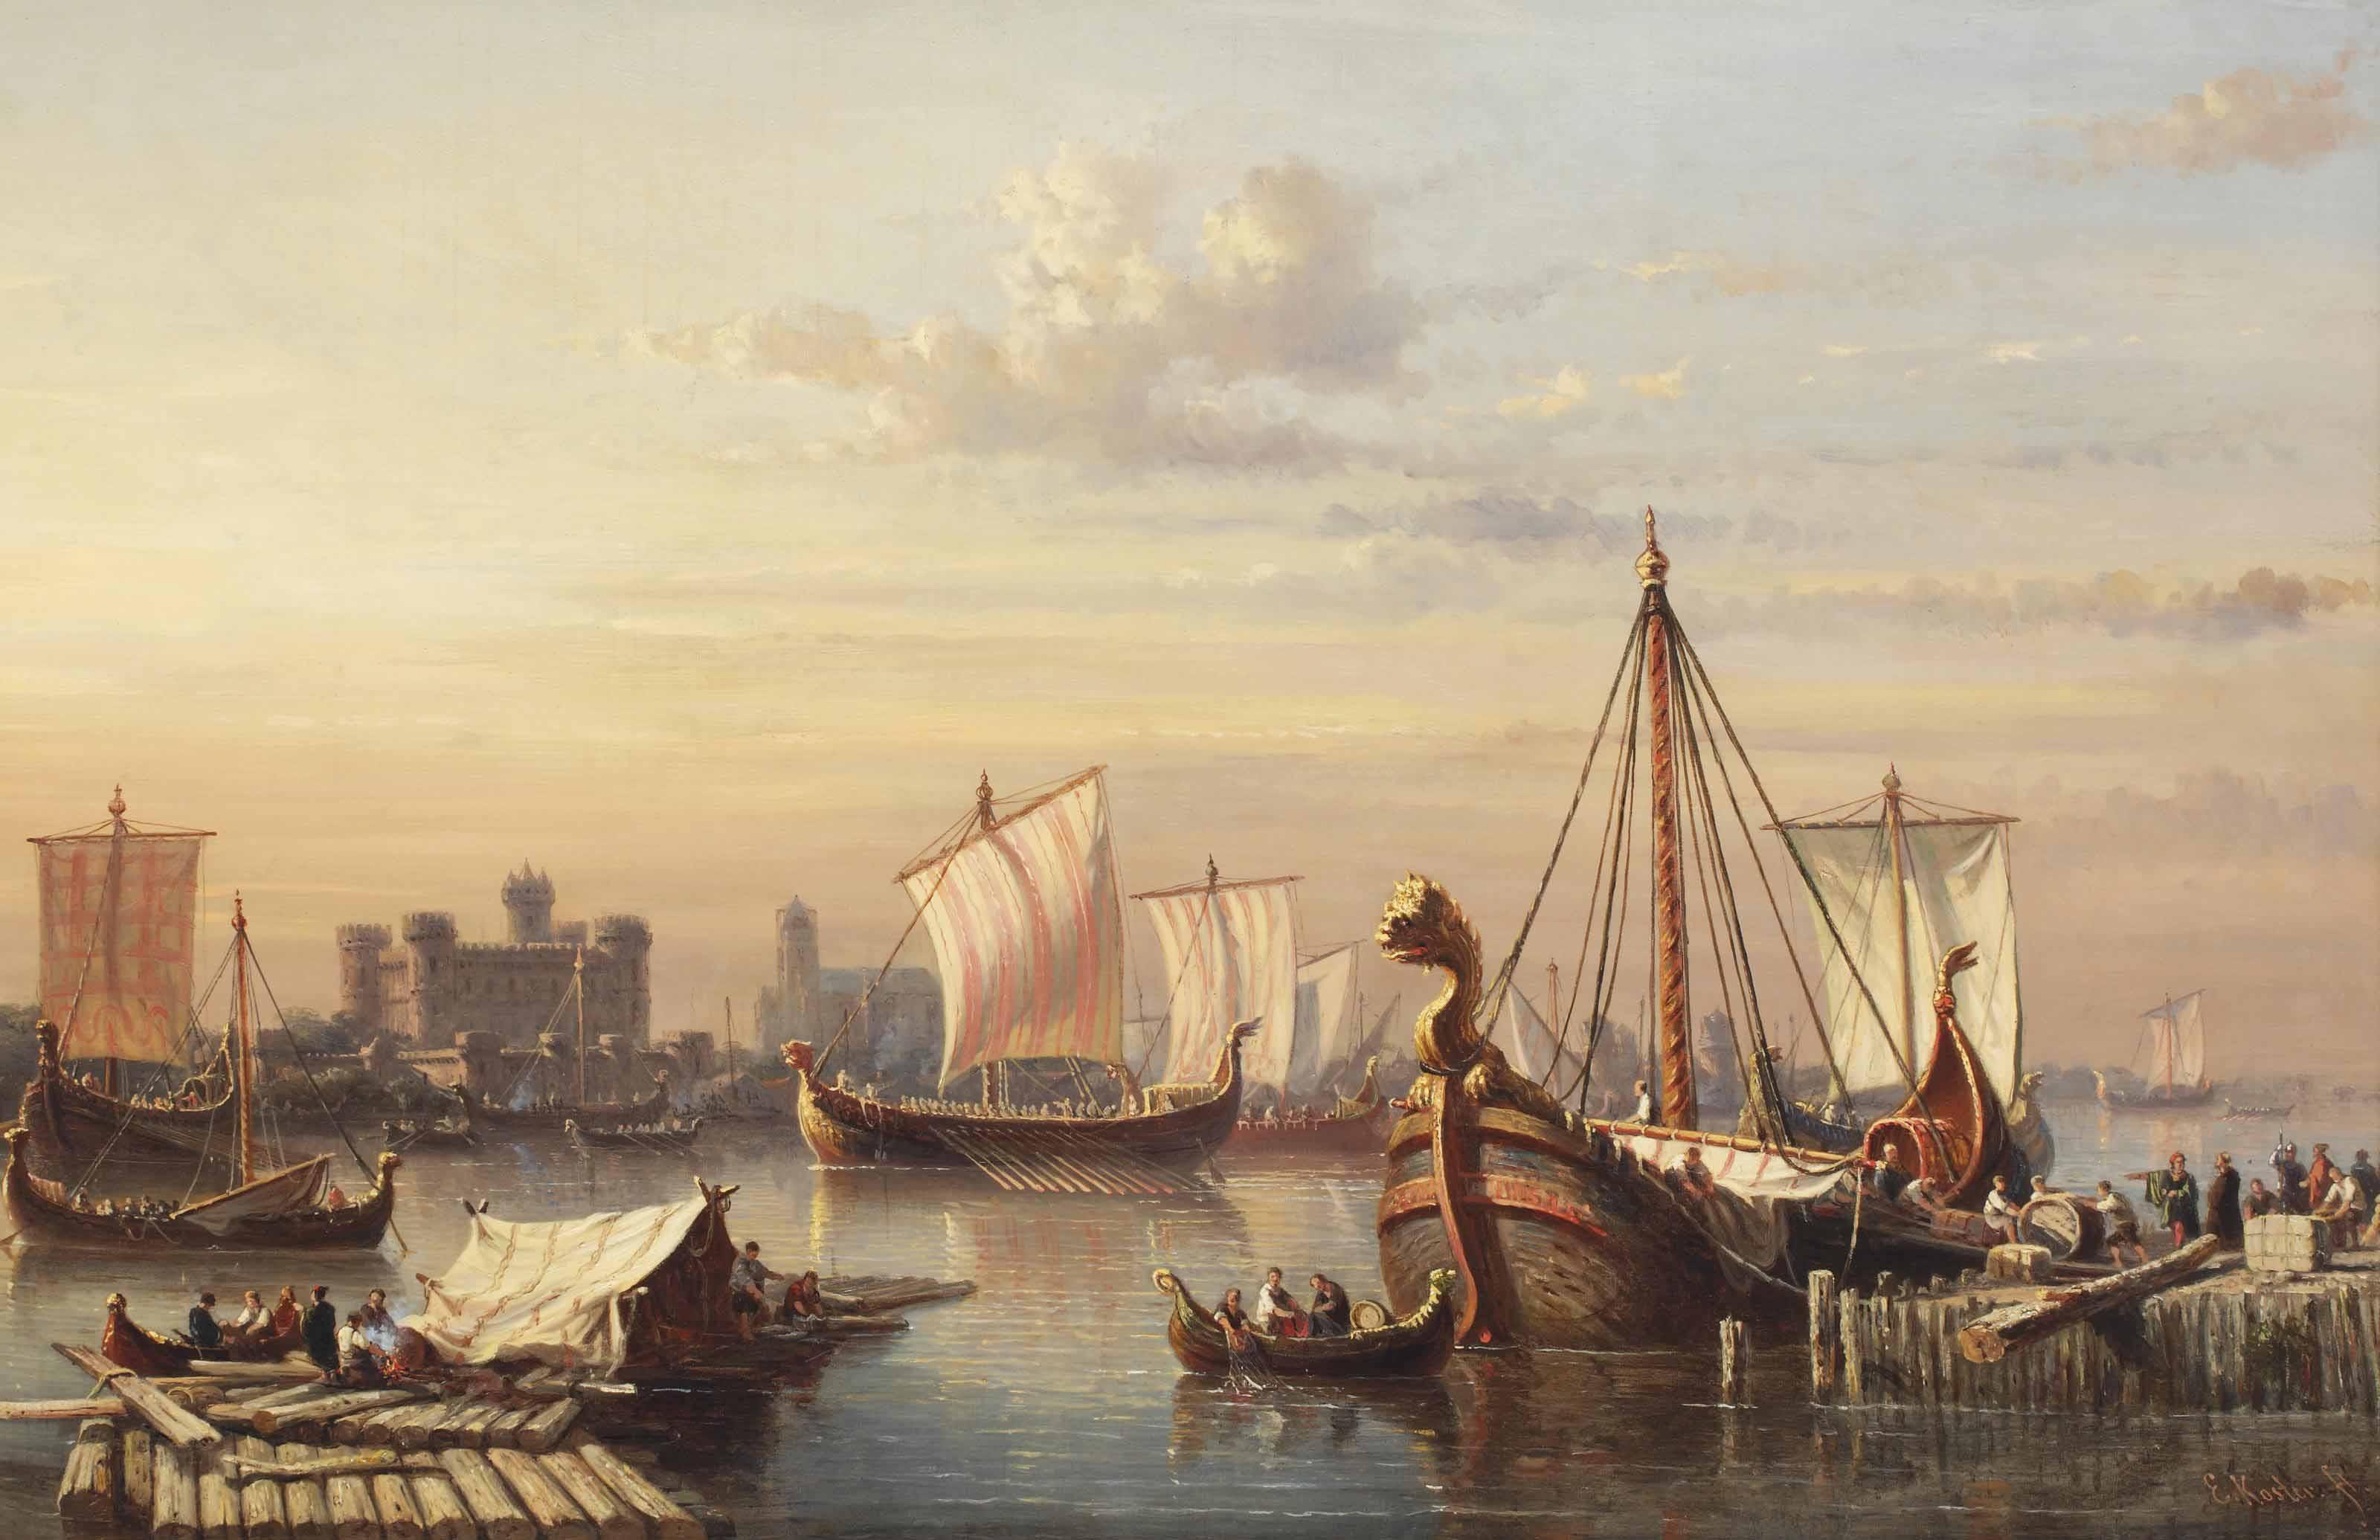 File:Everhardus Koster - Viking ships on the river Thames